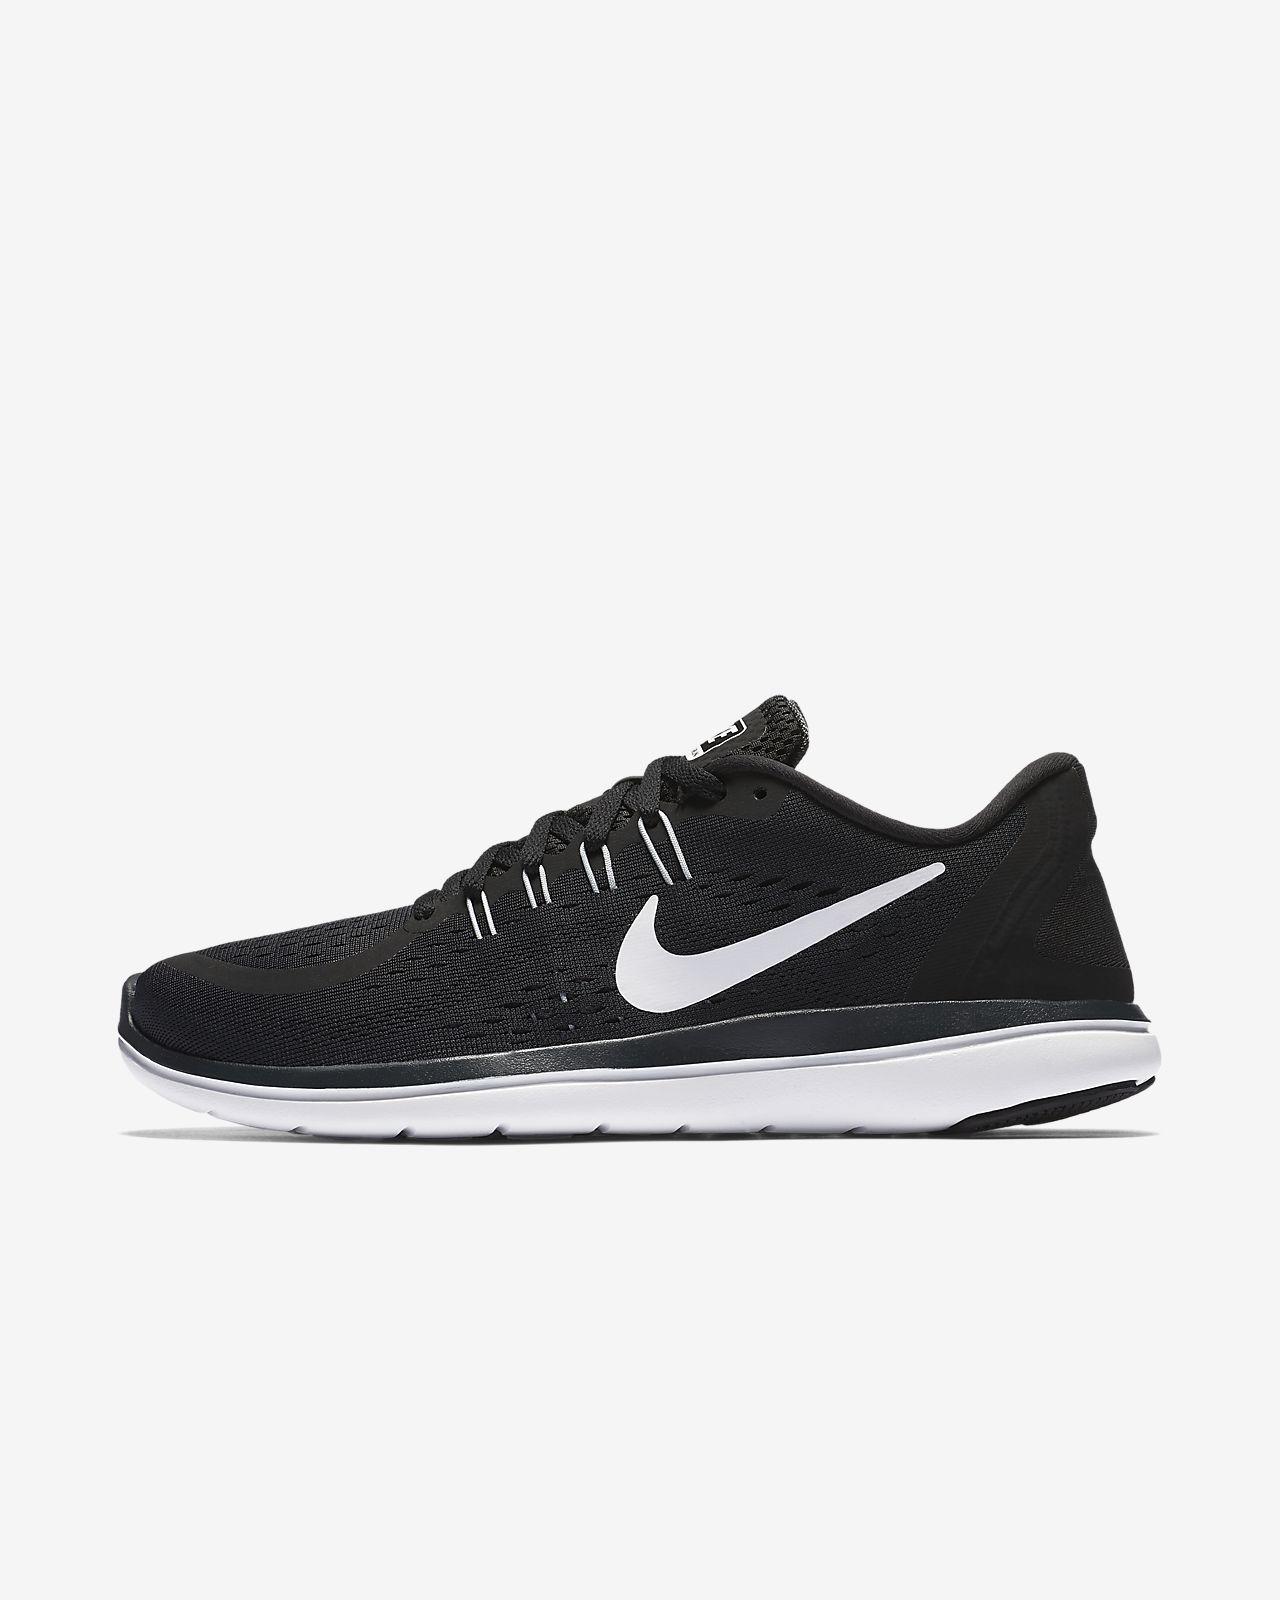 sports shoes c871b 94a07 ... Chaussure de running Nike Flex 2017 RN pour Femme